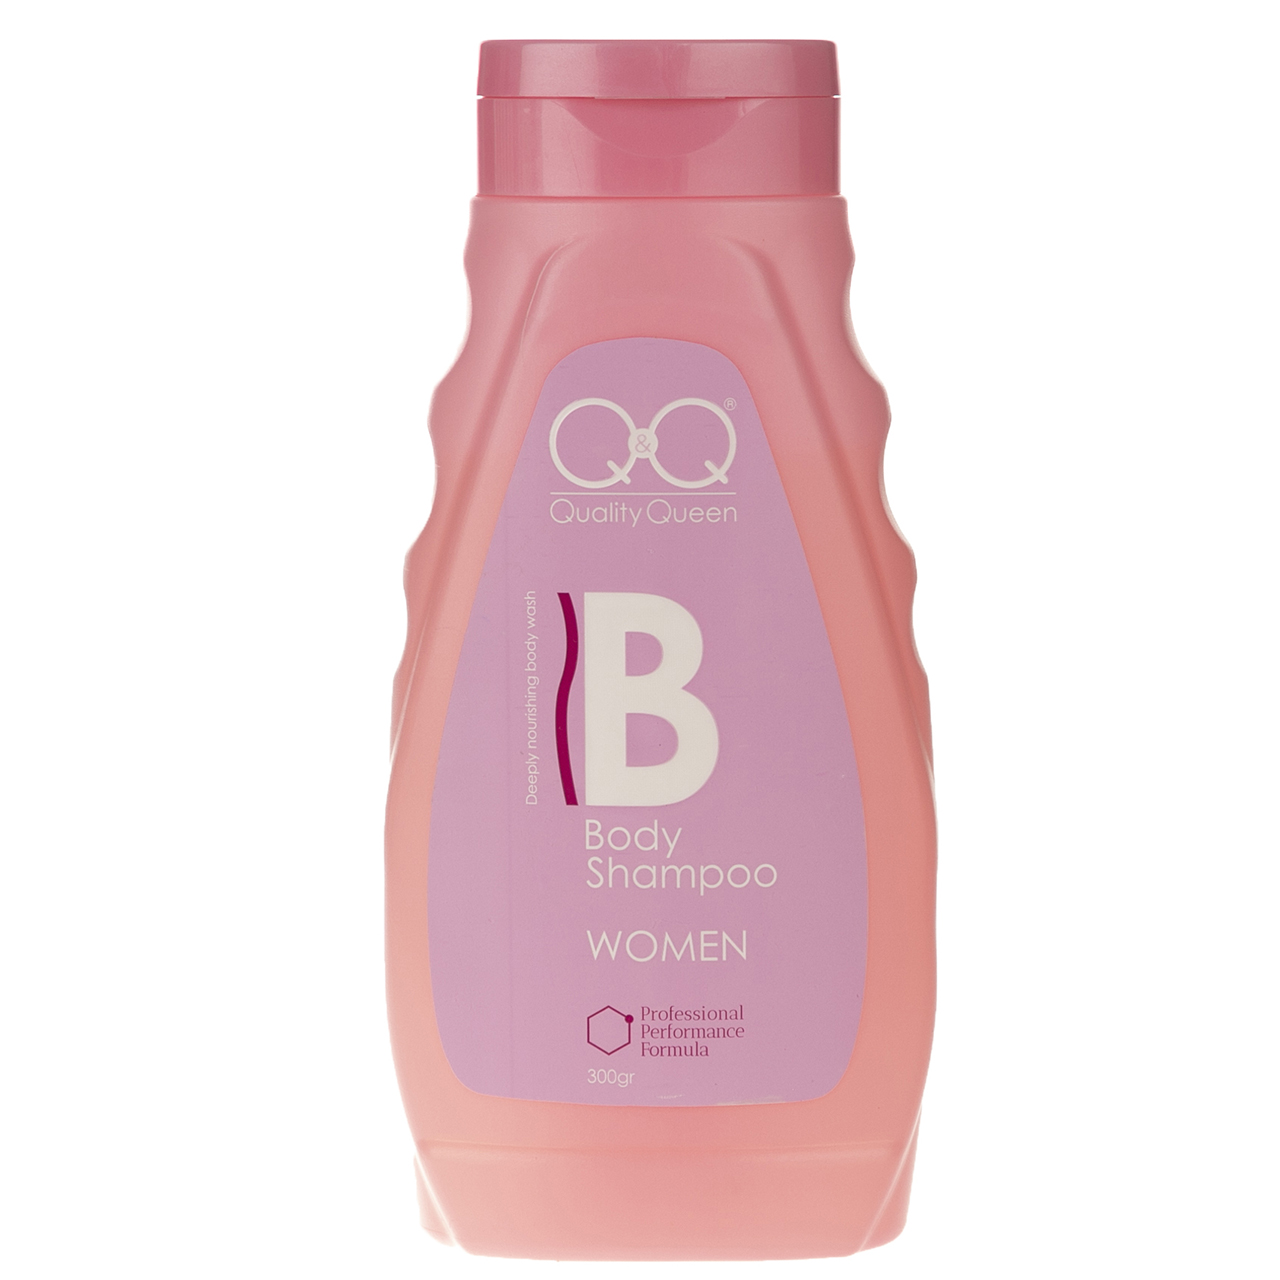 شامپو بدن کیو اند کیو مدل Quality Queen Pink حجم 300 میلی لیتر